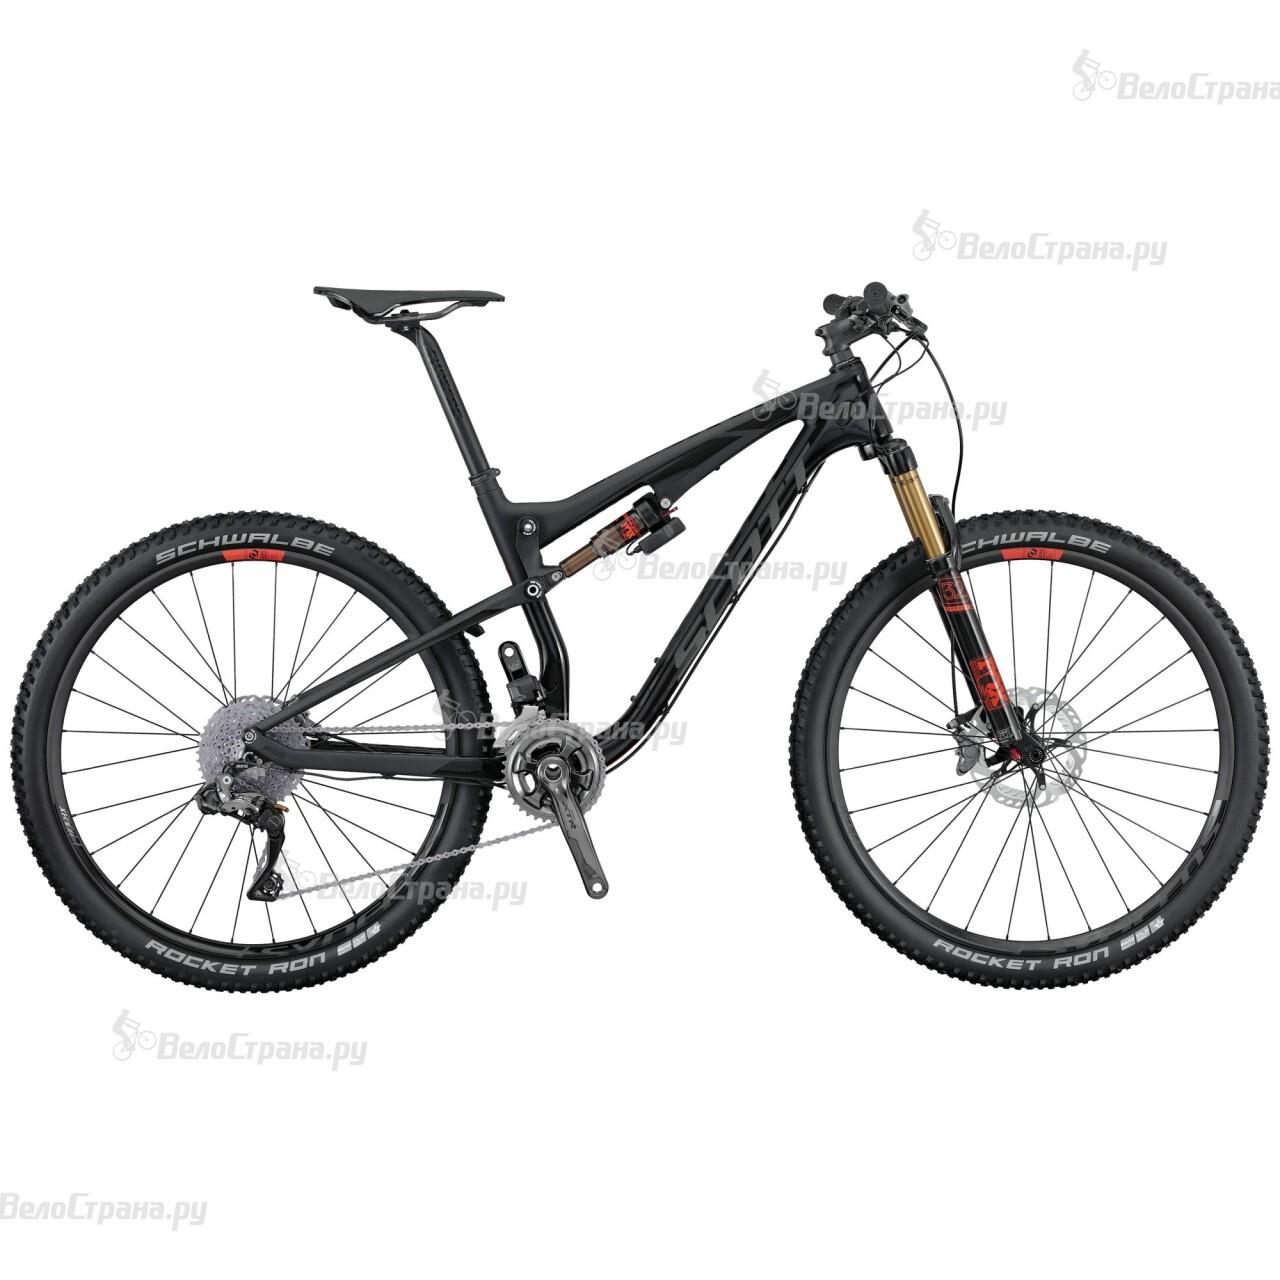 Велосипед Scott Spark 700 Ultimate (2016) велосипед scott spark 700 premium 2015